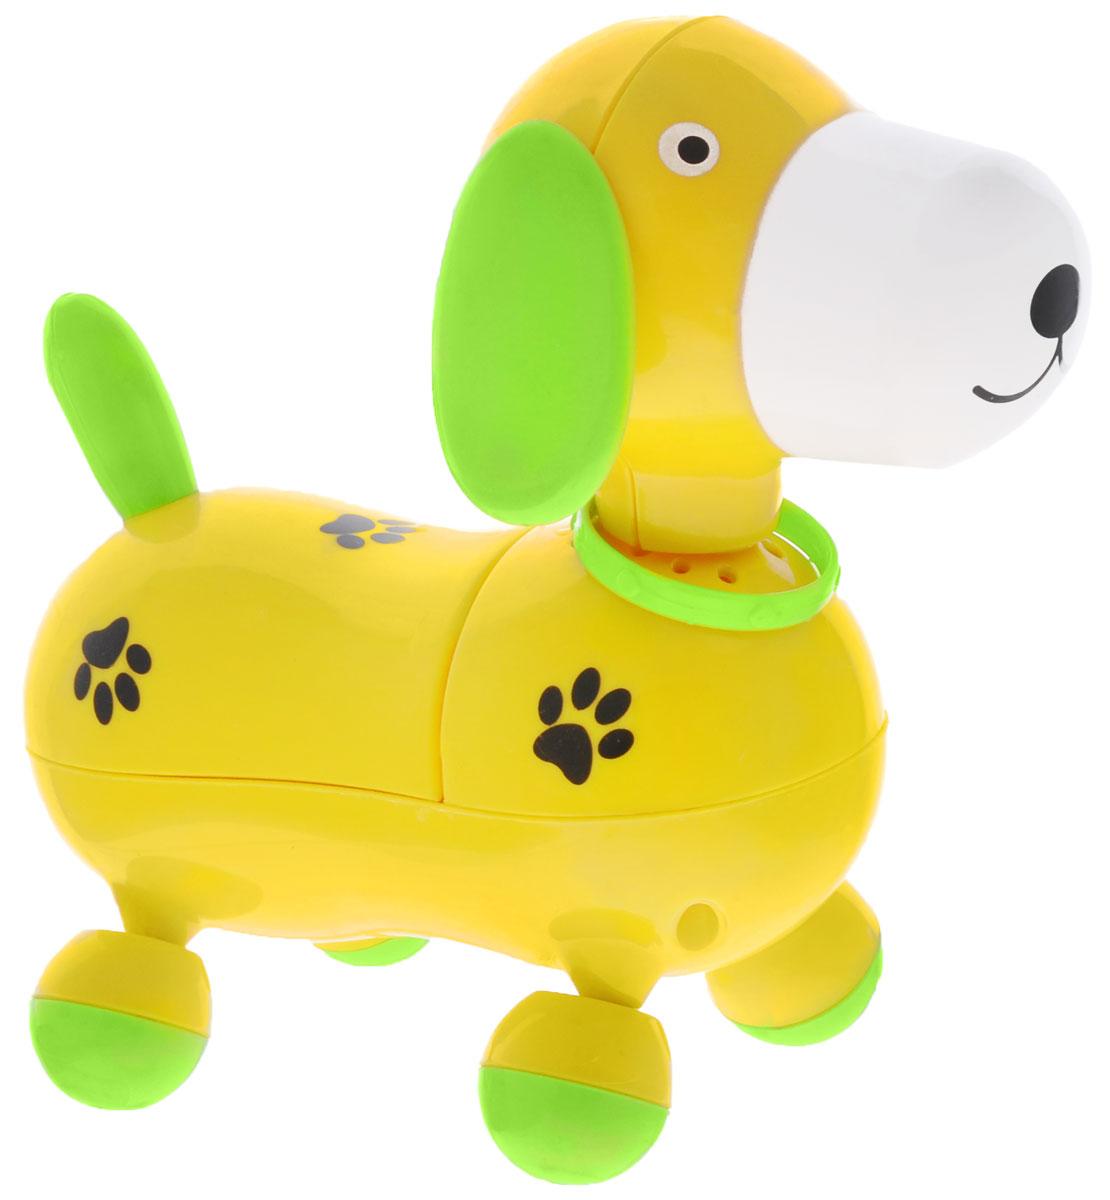 Mommy Love Электронная развивающая игрушка Веселый щенок цвет желтый, Dream Makers